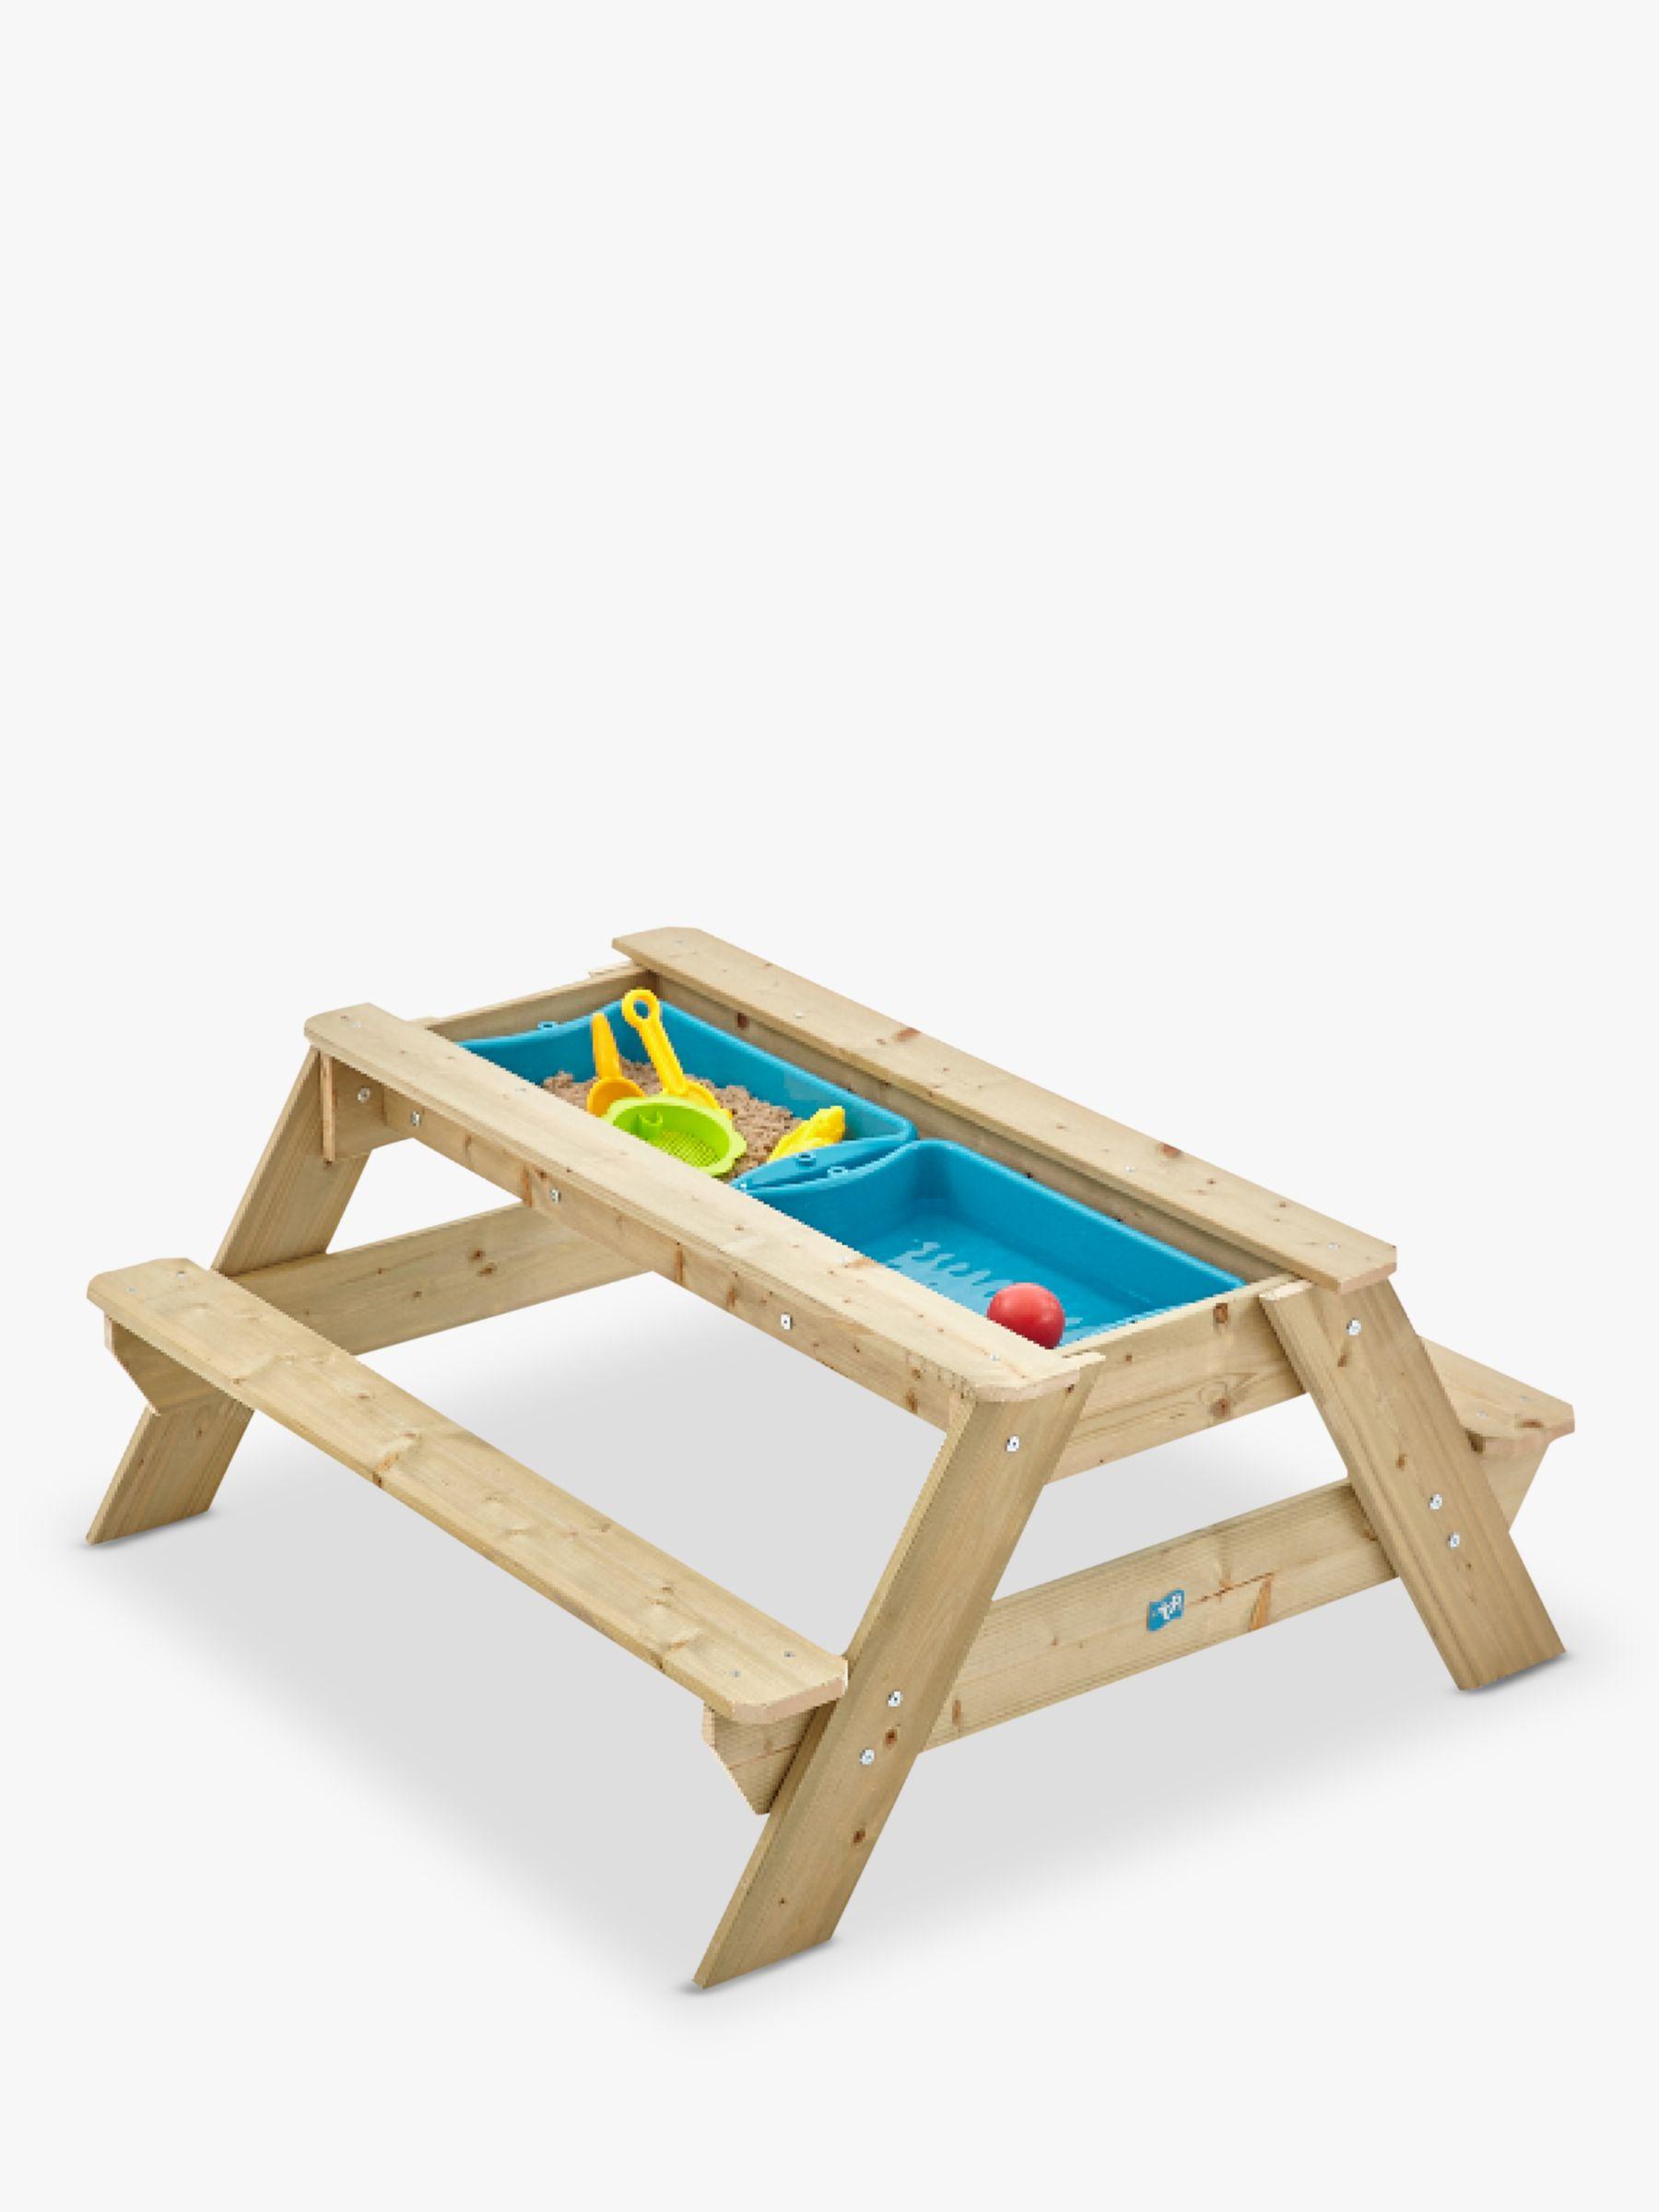 TP Toys TP Toys TP286 Deluxe Picnic Table Sandpit